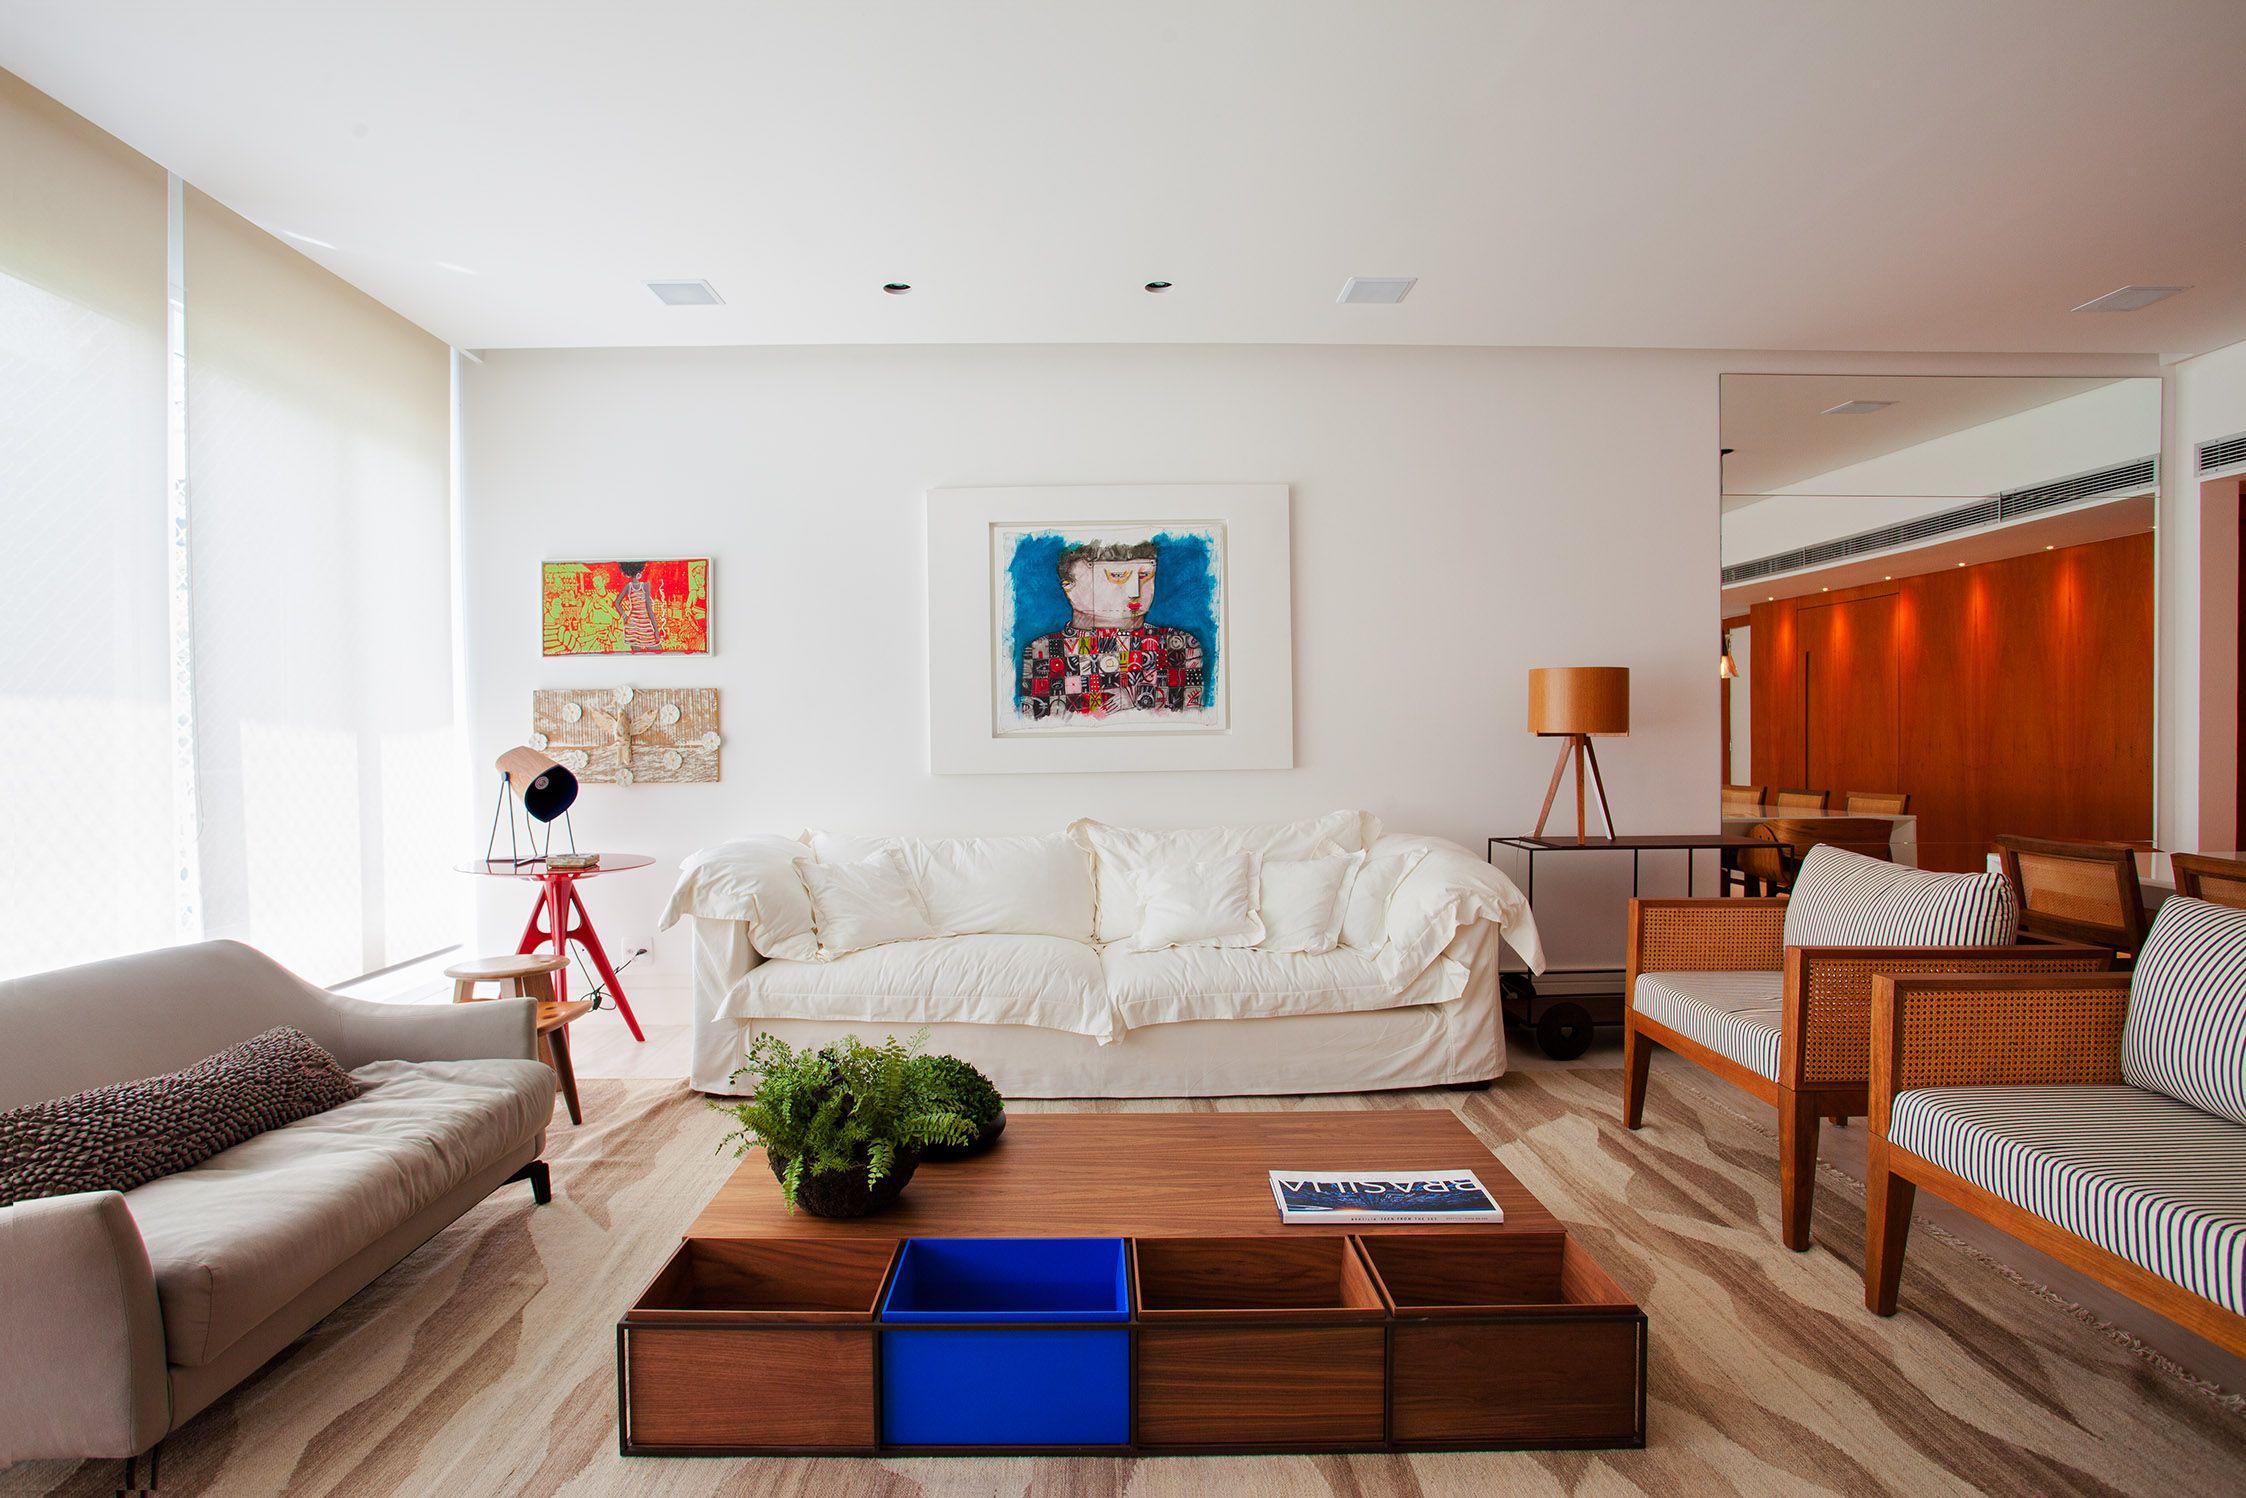 sala de estar - sala - living room - Studio 021 Arquitetura